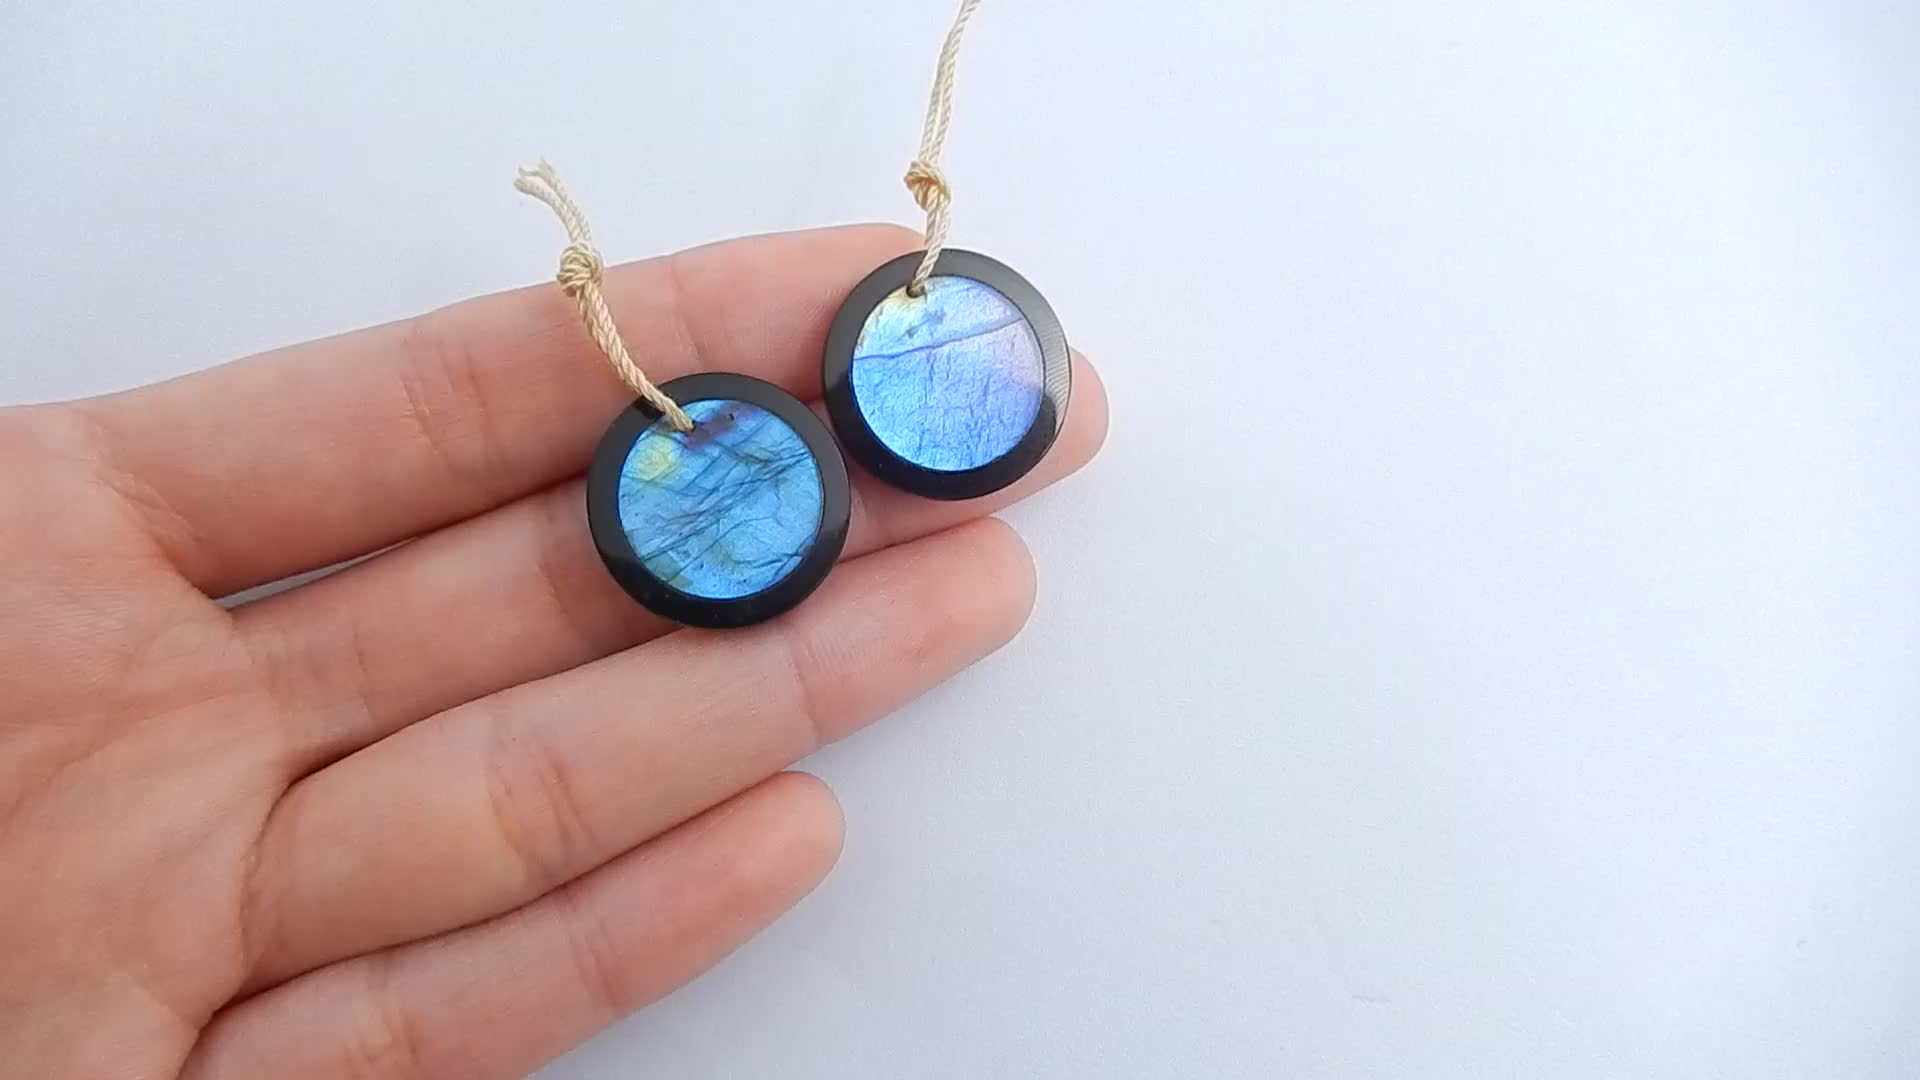 Custom Designed Earrings Fashion Jewelry Semiprecious Stones Labradorite Obsidian Natural Beads 32x13x4mm 6.1g